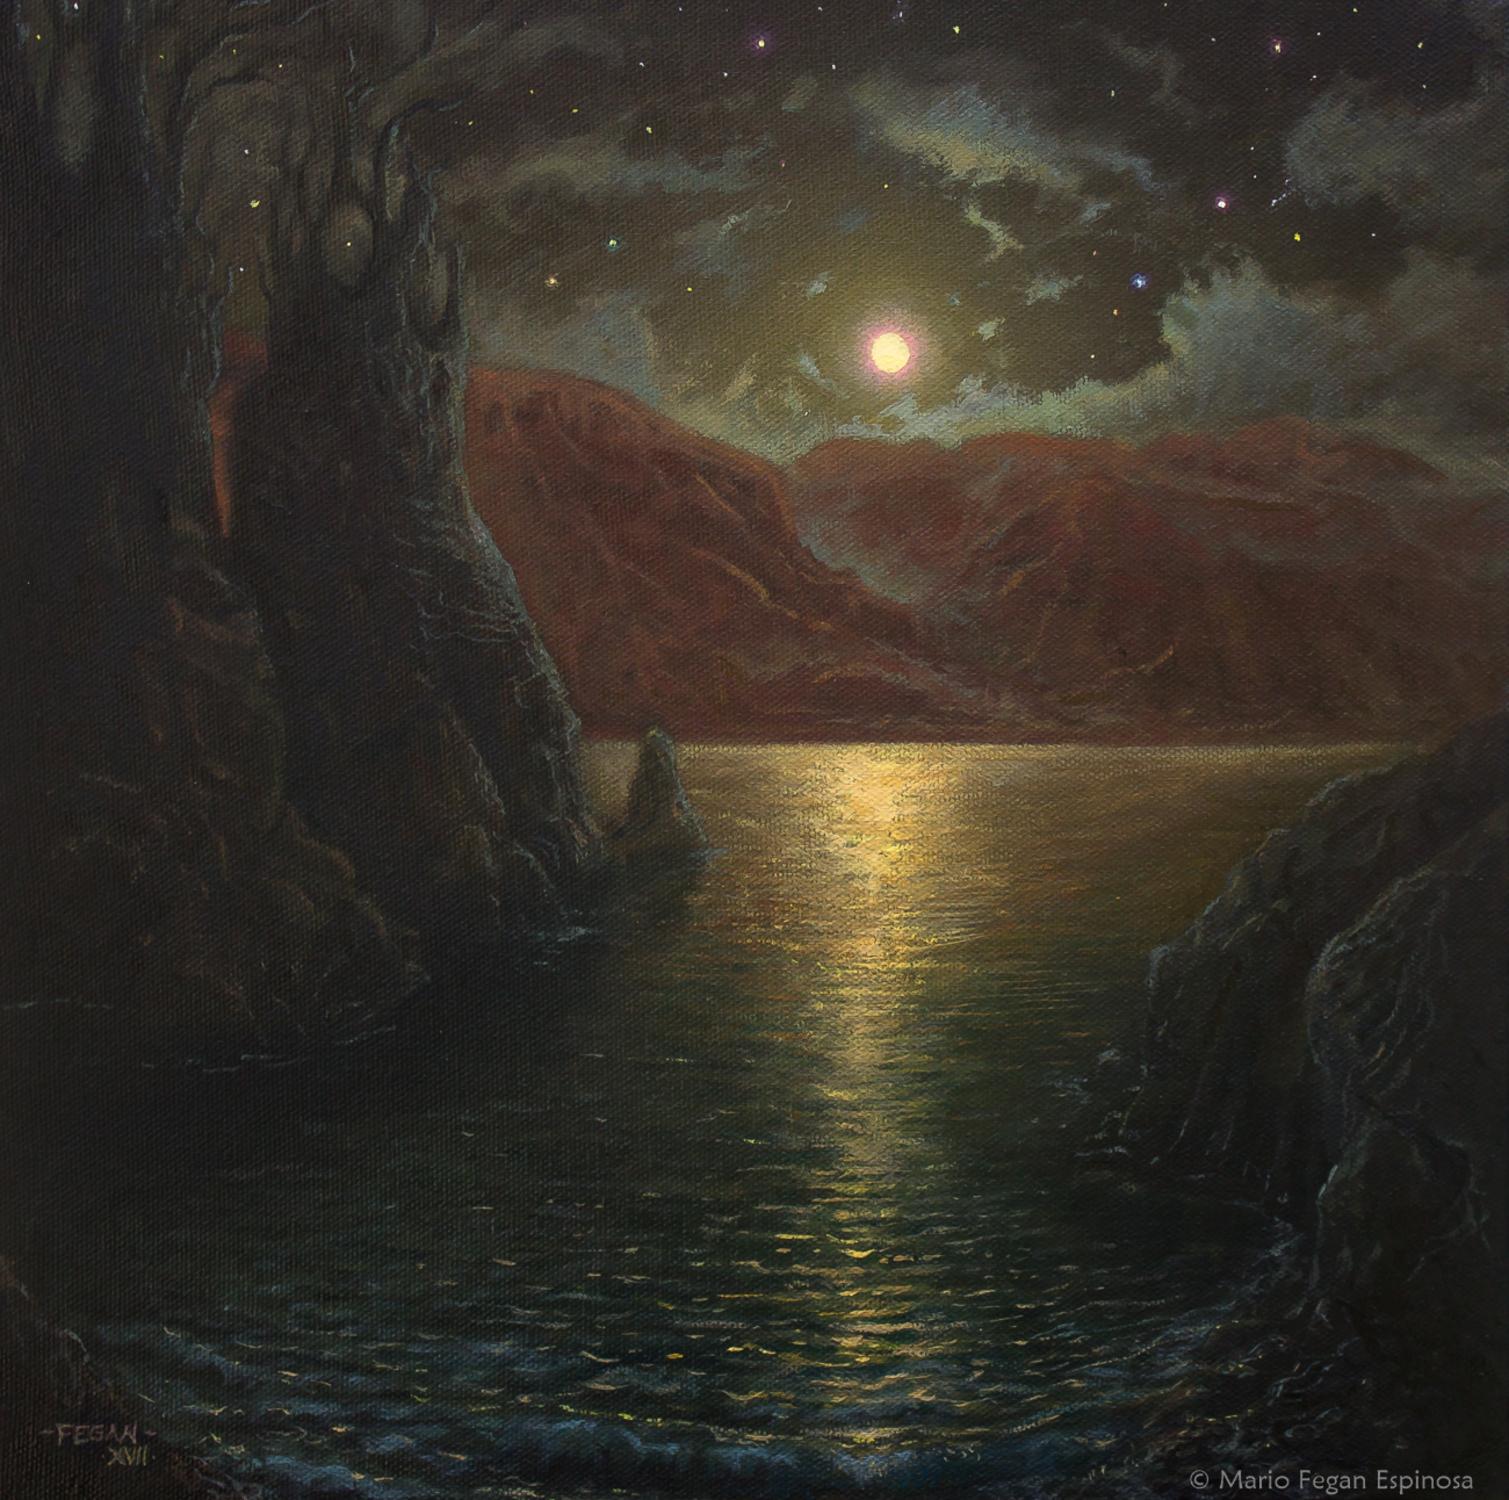 Astral Cove  Artwork by Mario  Fegan